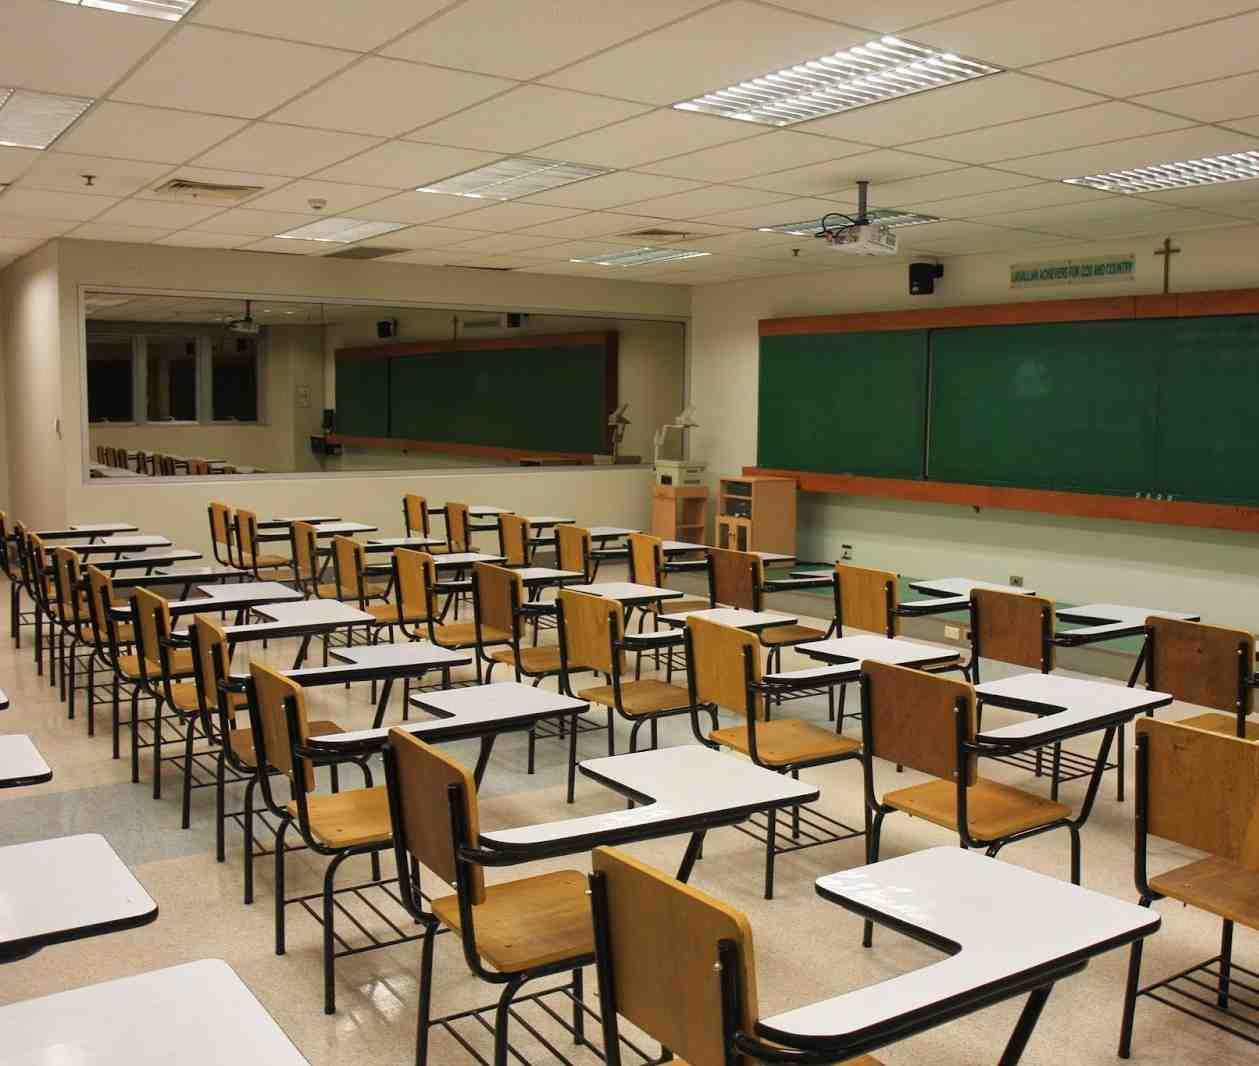 Middle School Desks